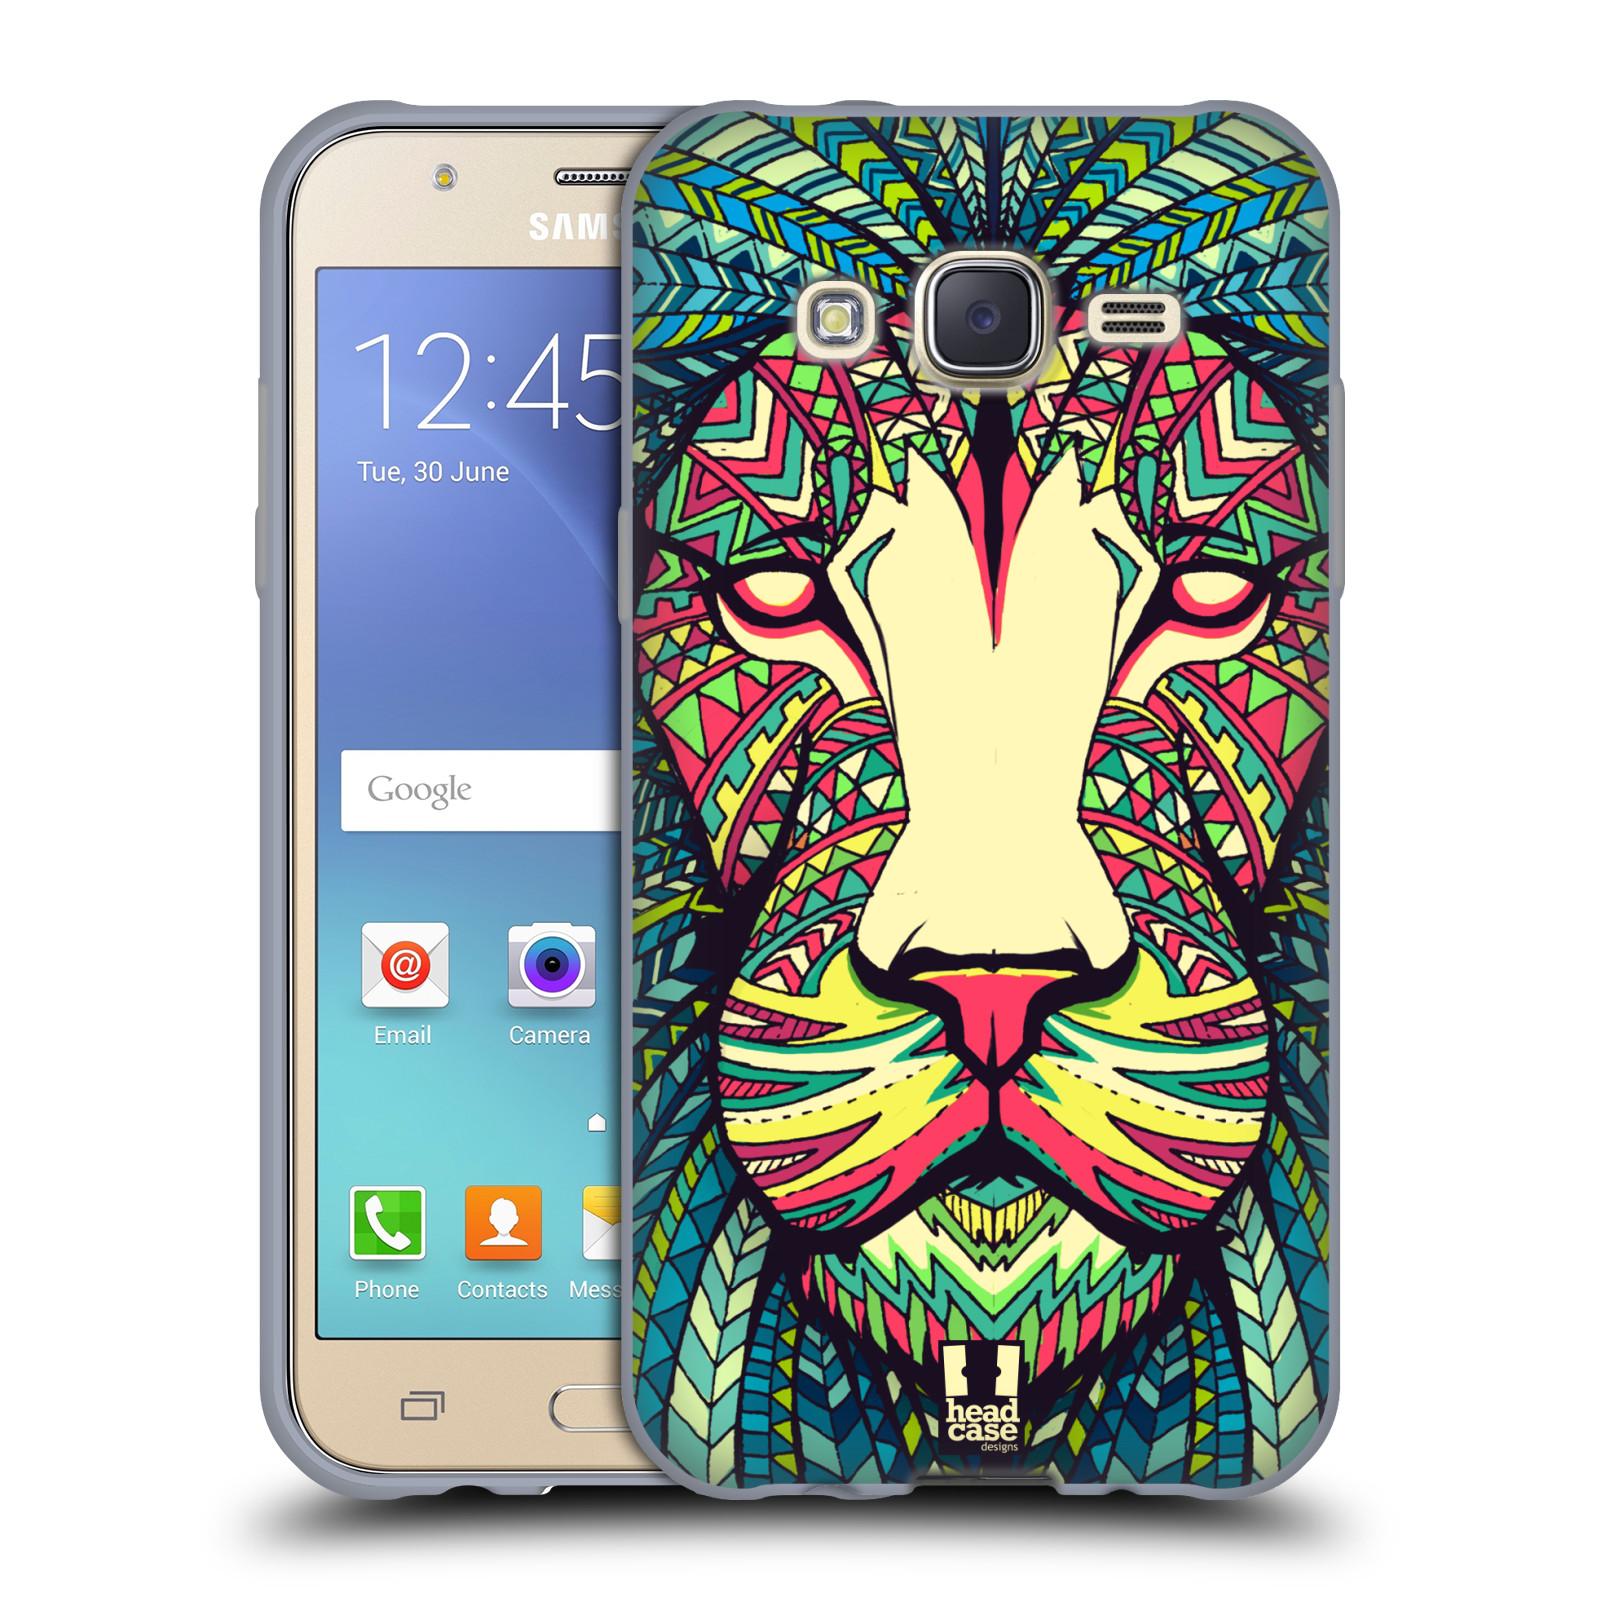 HEAD CASE silikonový obal na mobil Samsung Galaxy J5, J500, (J5 DUOS) vzor Aztécký motiv zvíře lev